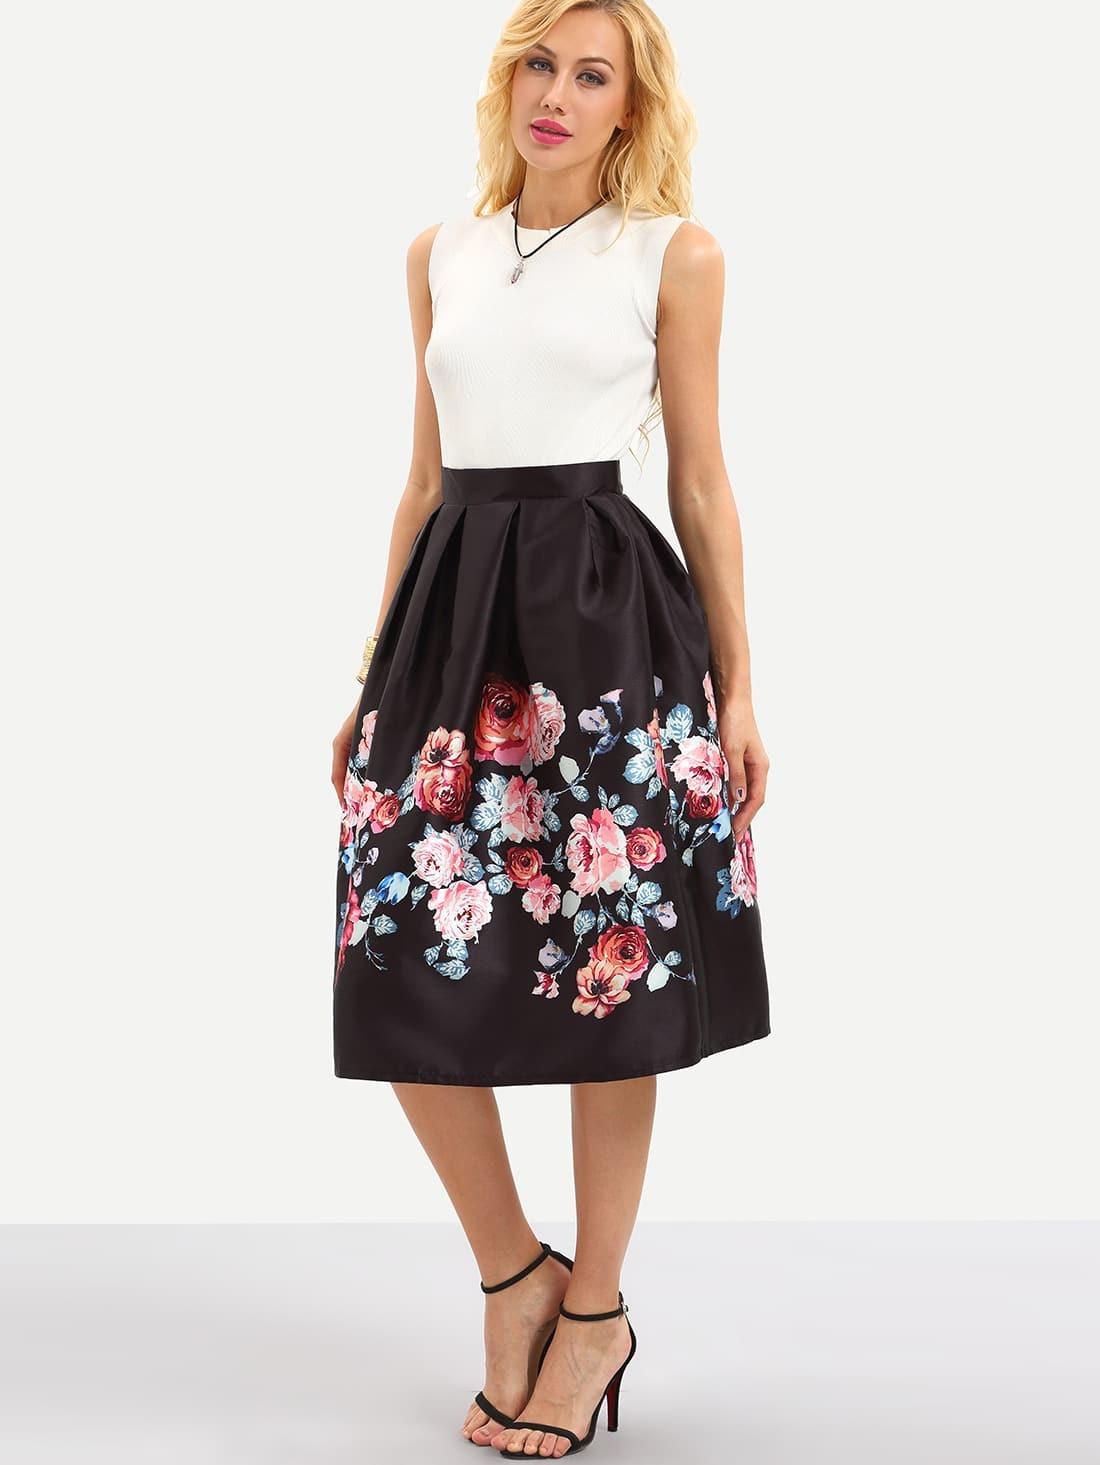 Flower Print Box Pleated Midi Skirt - Black -SheIn(Sheinside)